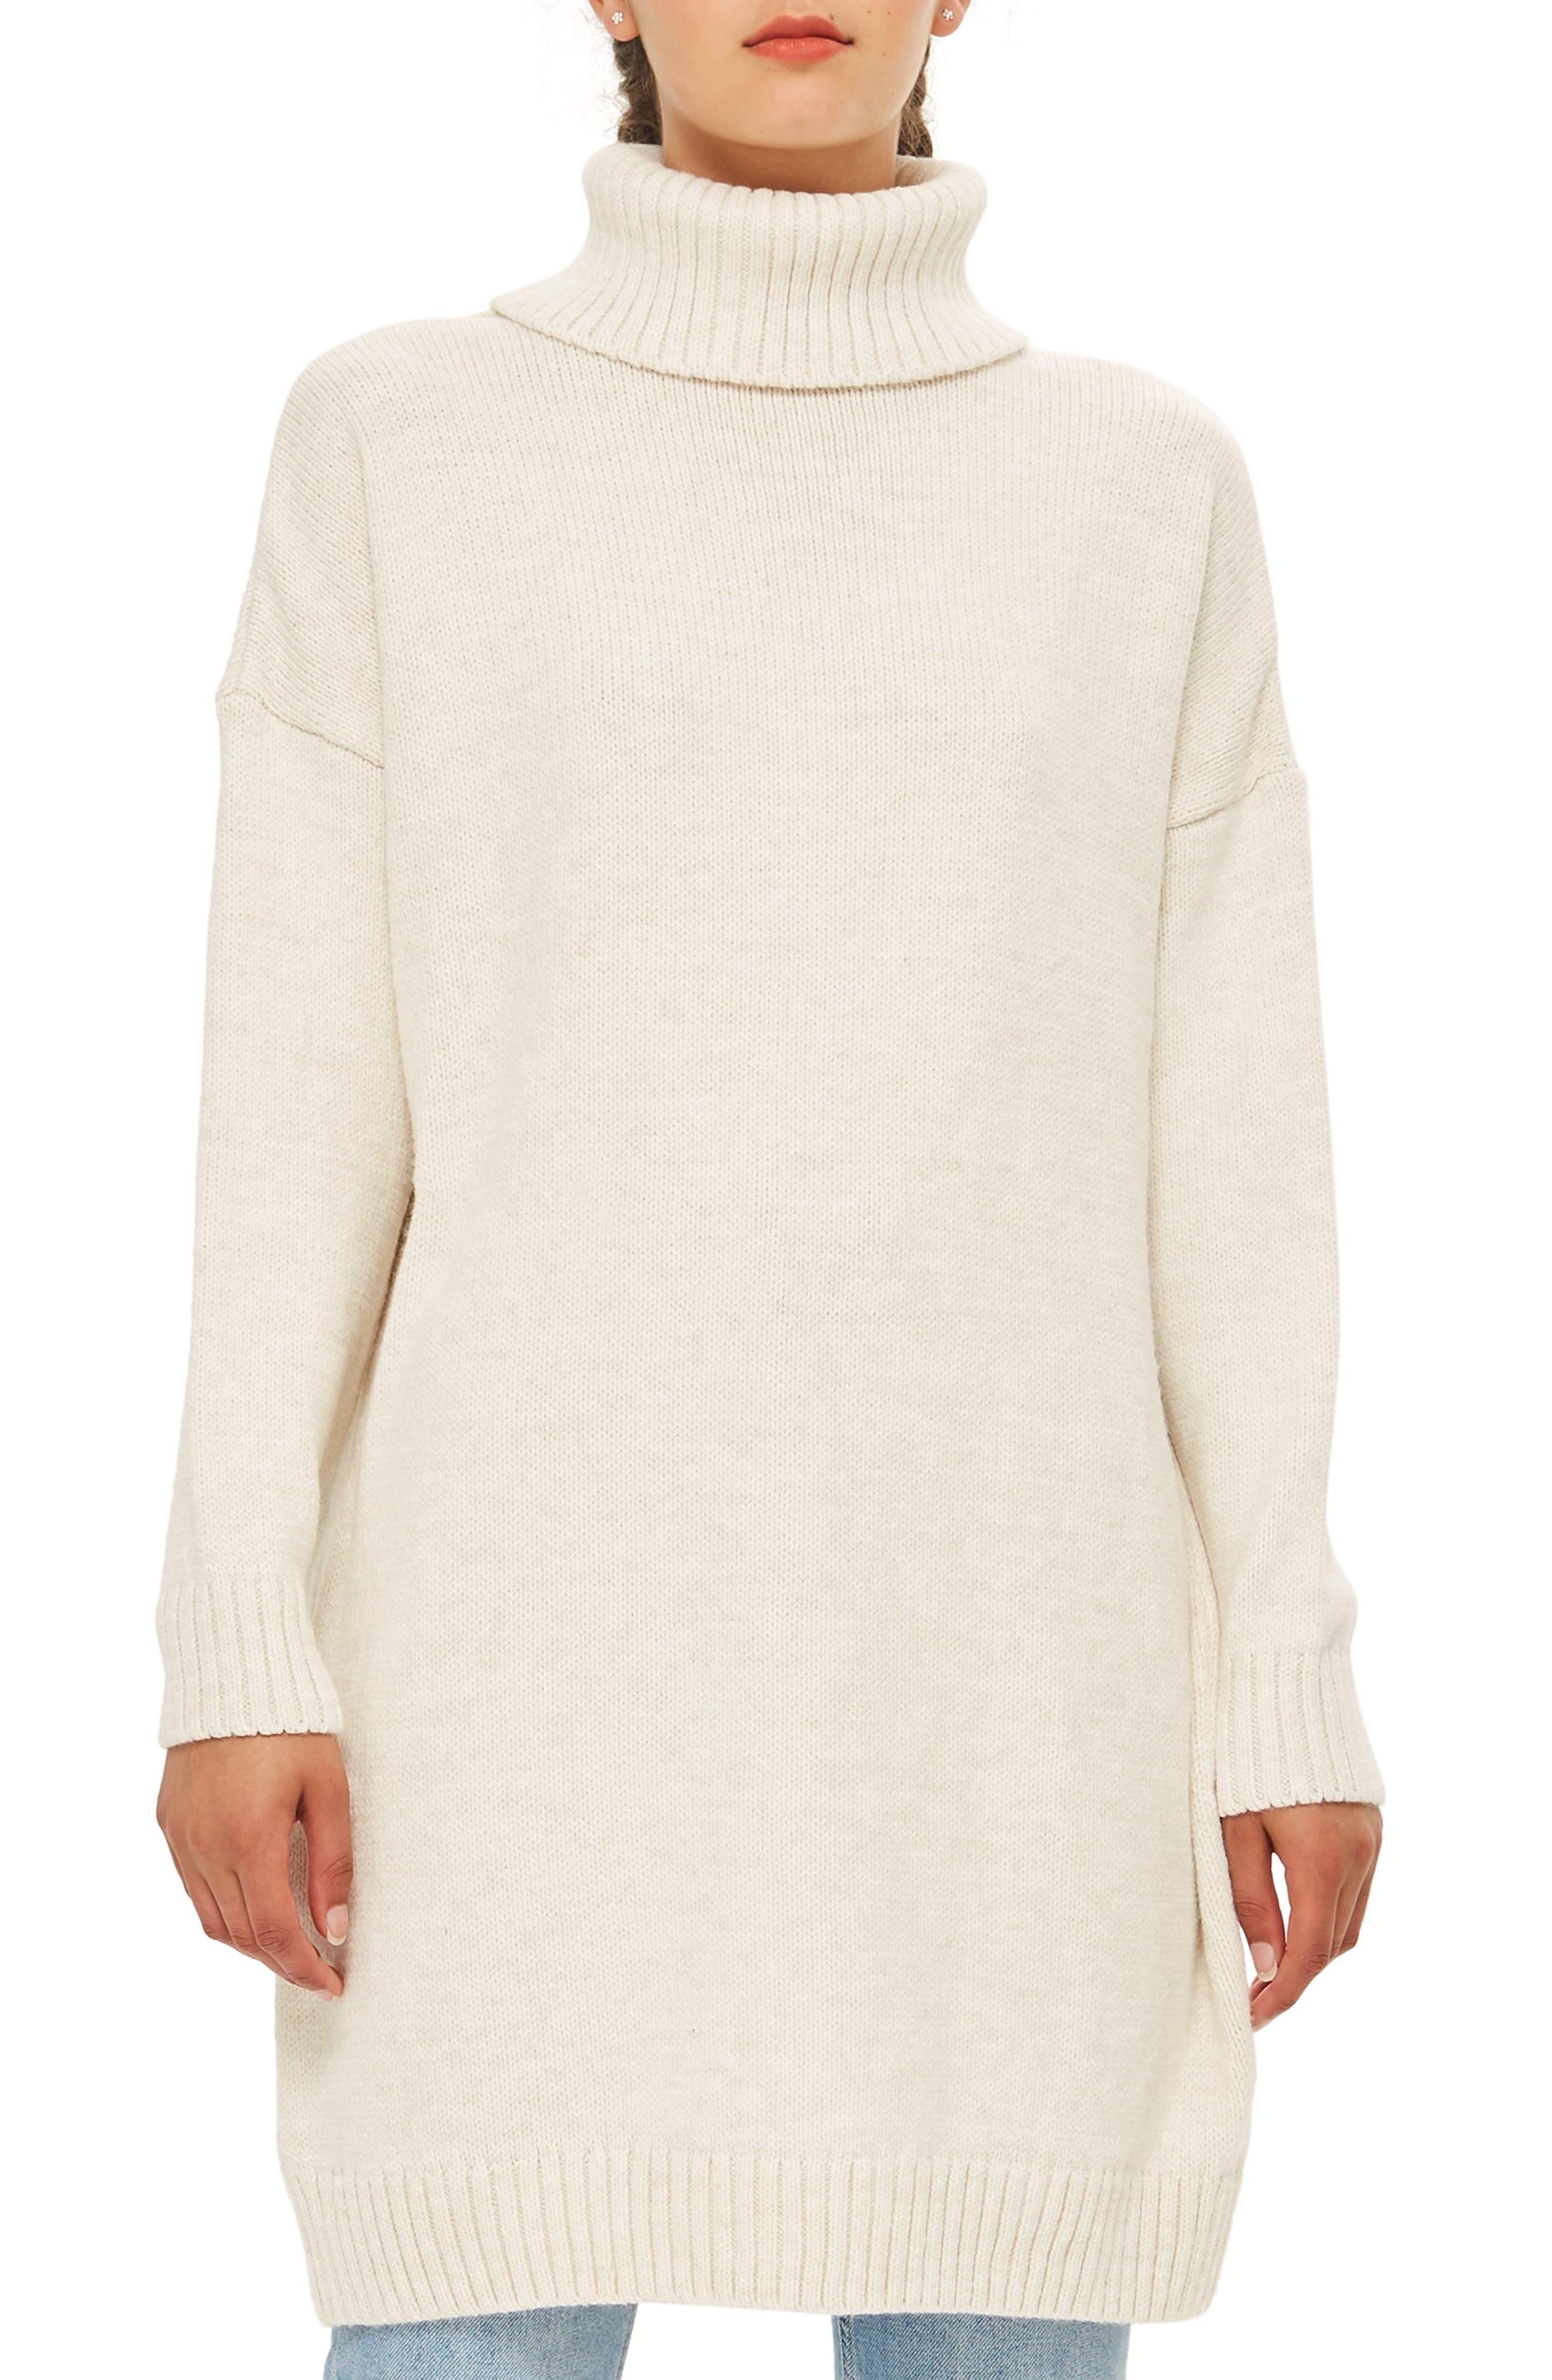 Topshop Turtleneck Sweater Dress, US (fits like 2-4) - Beige